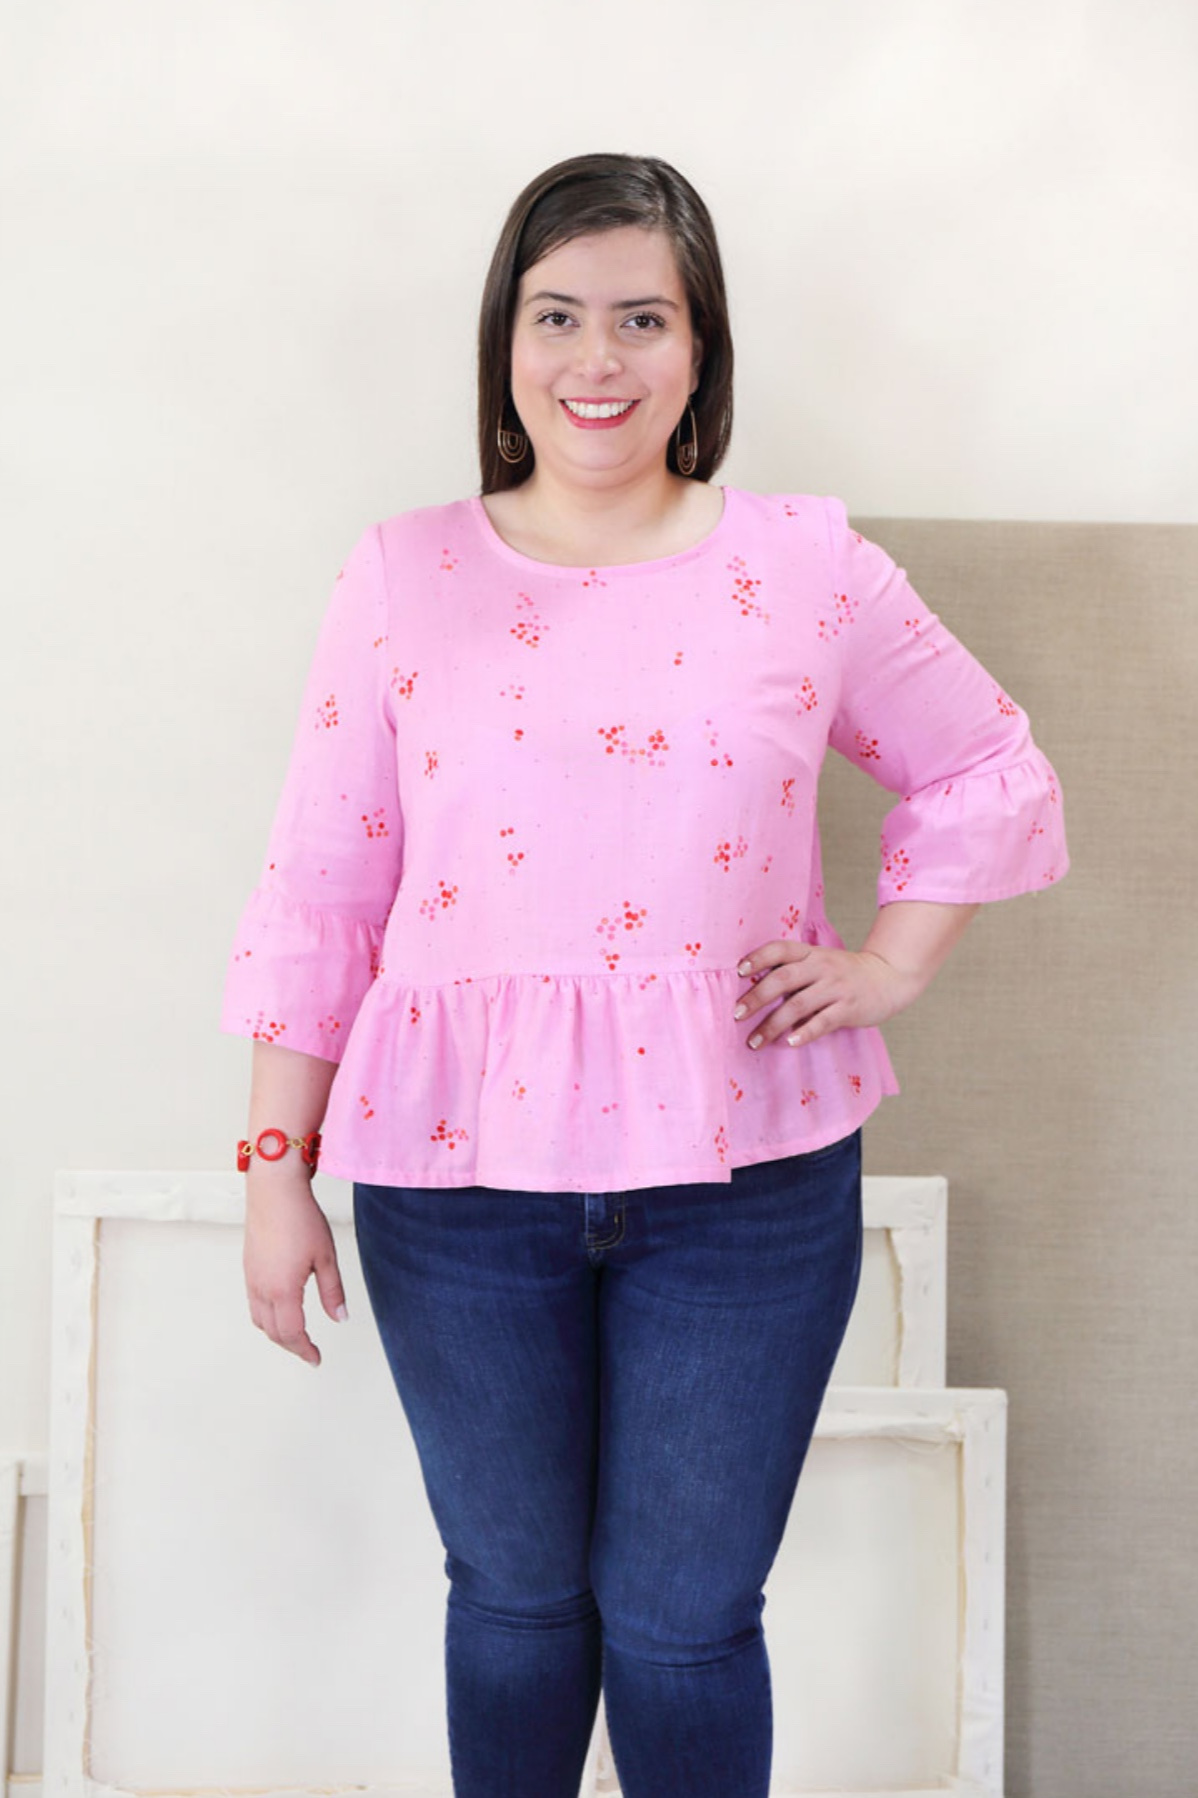 Gelato blouse + Dress sewing pattern (plus size) by Liesl +Co.jpeg